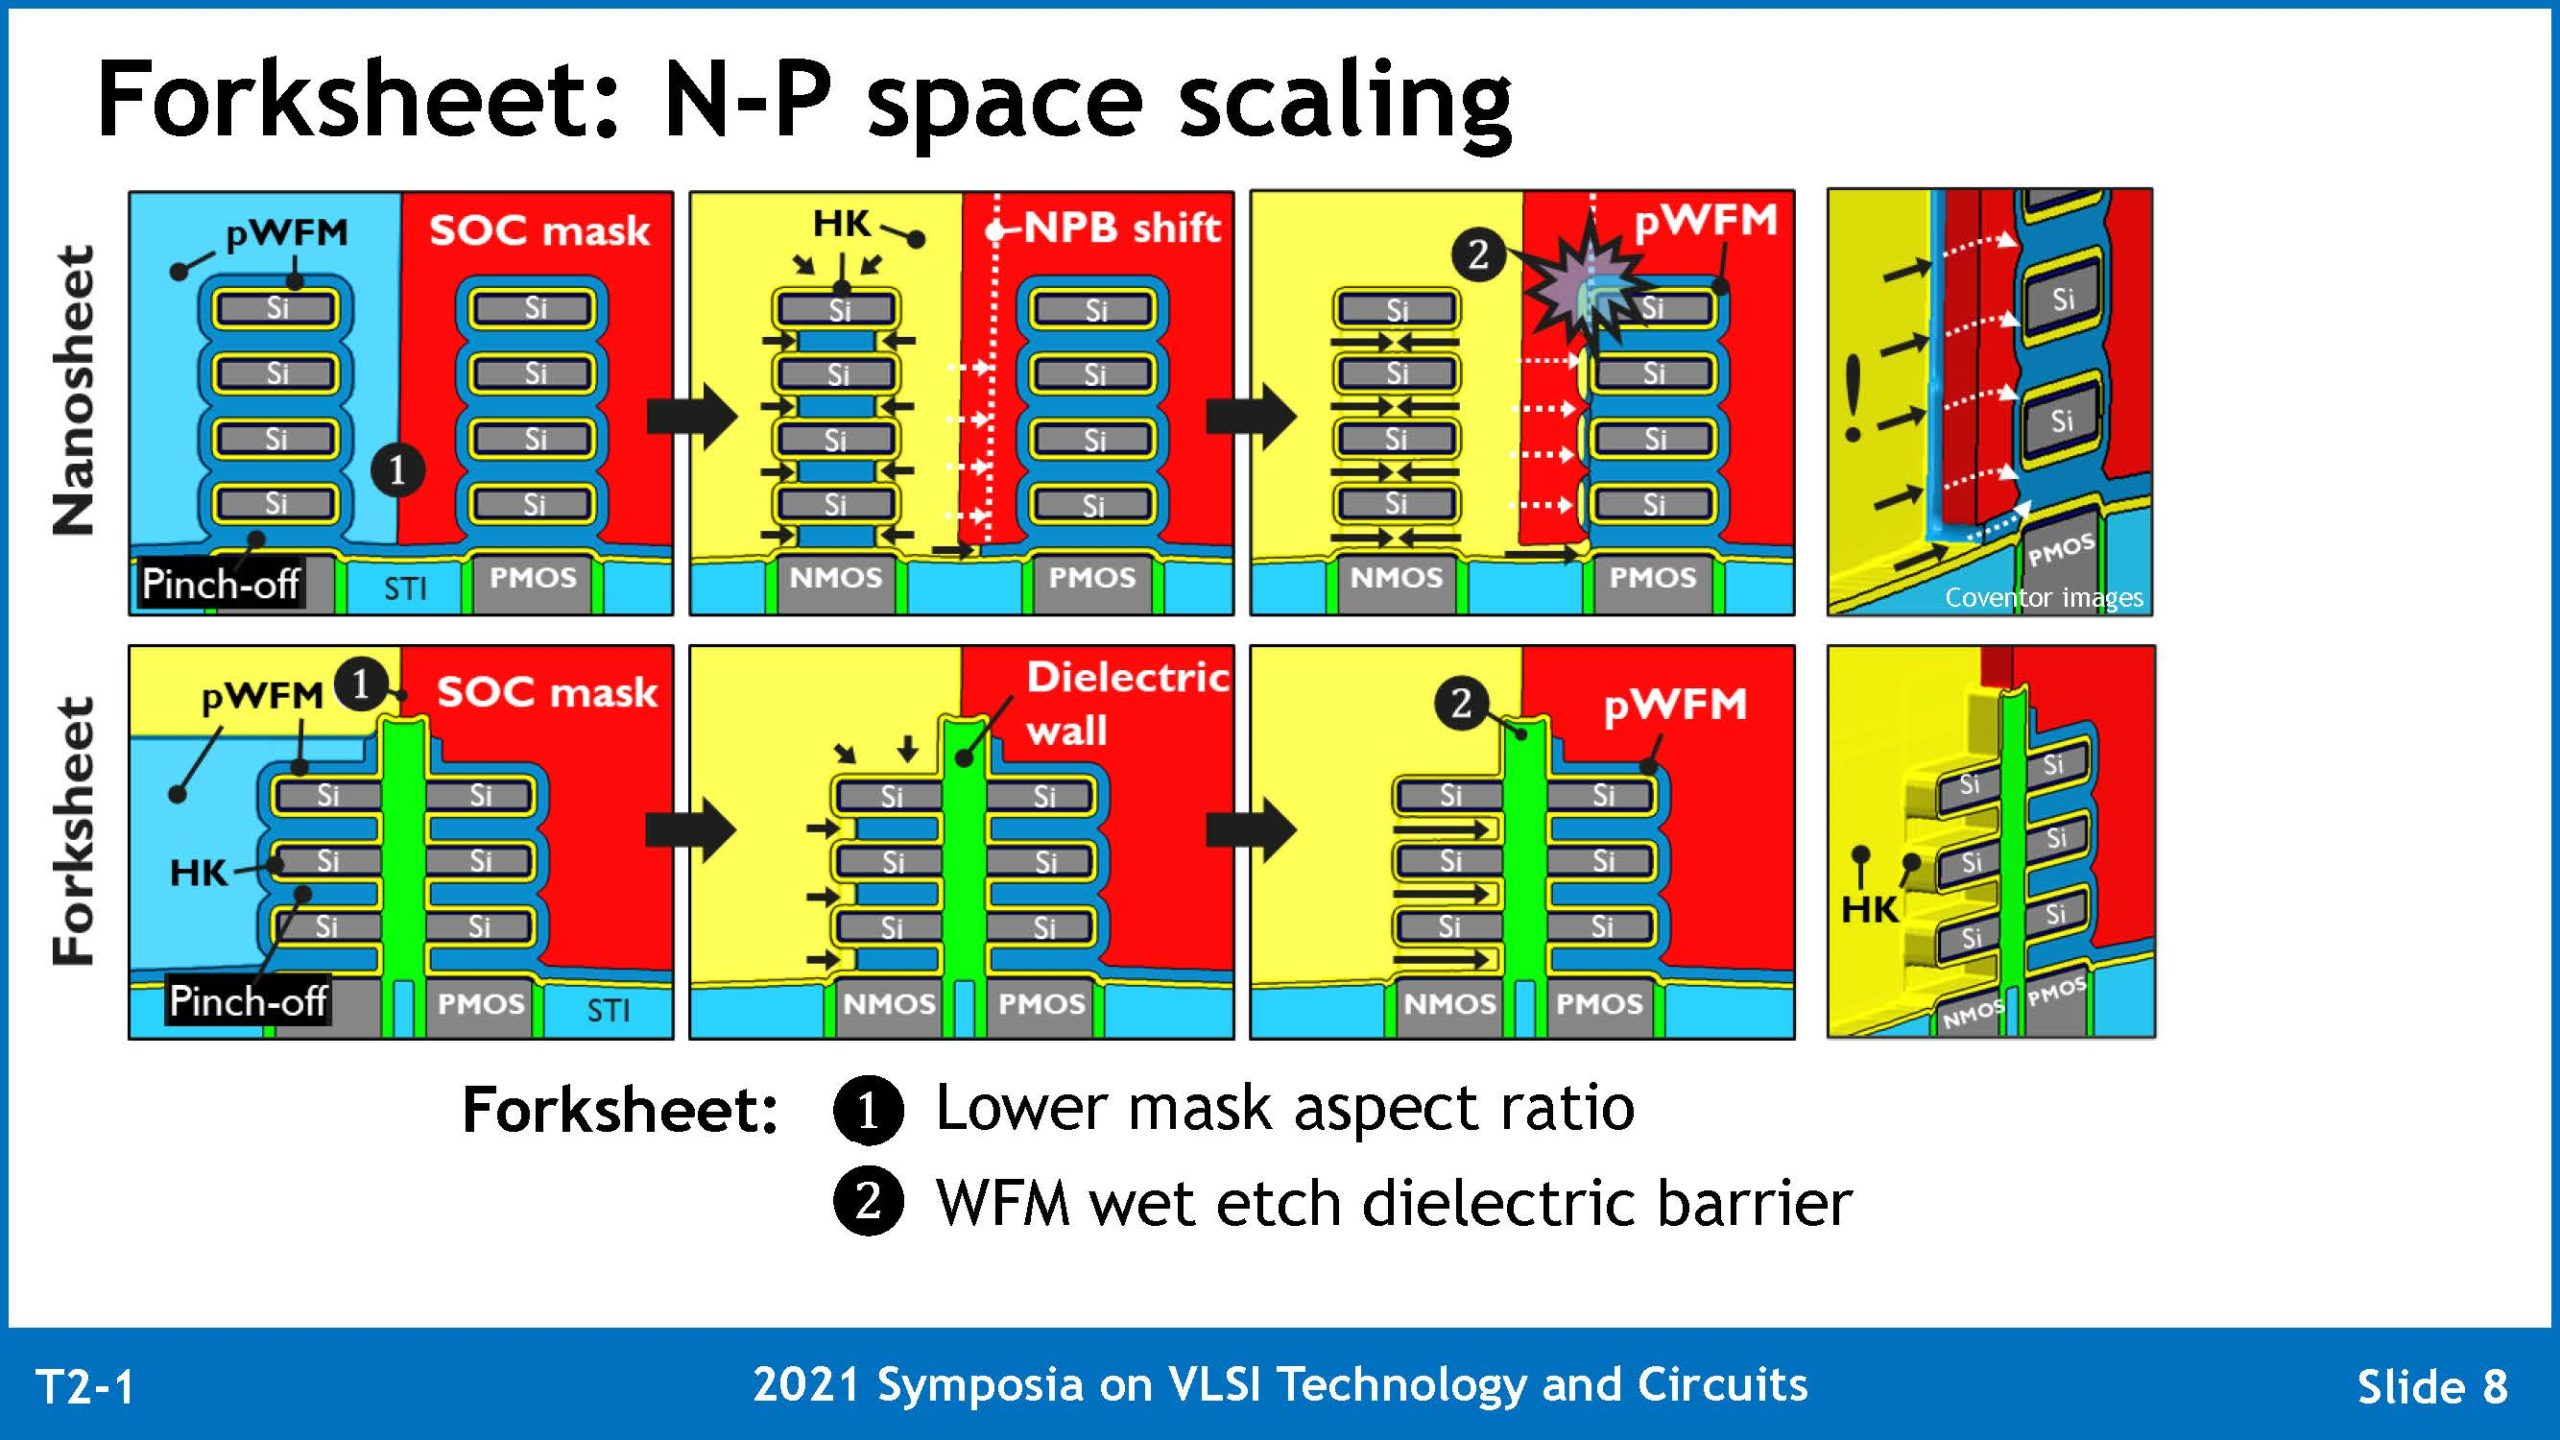 VLSI2021 T2 1 Mertens v2 Page 09 fs hns